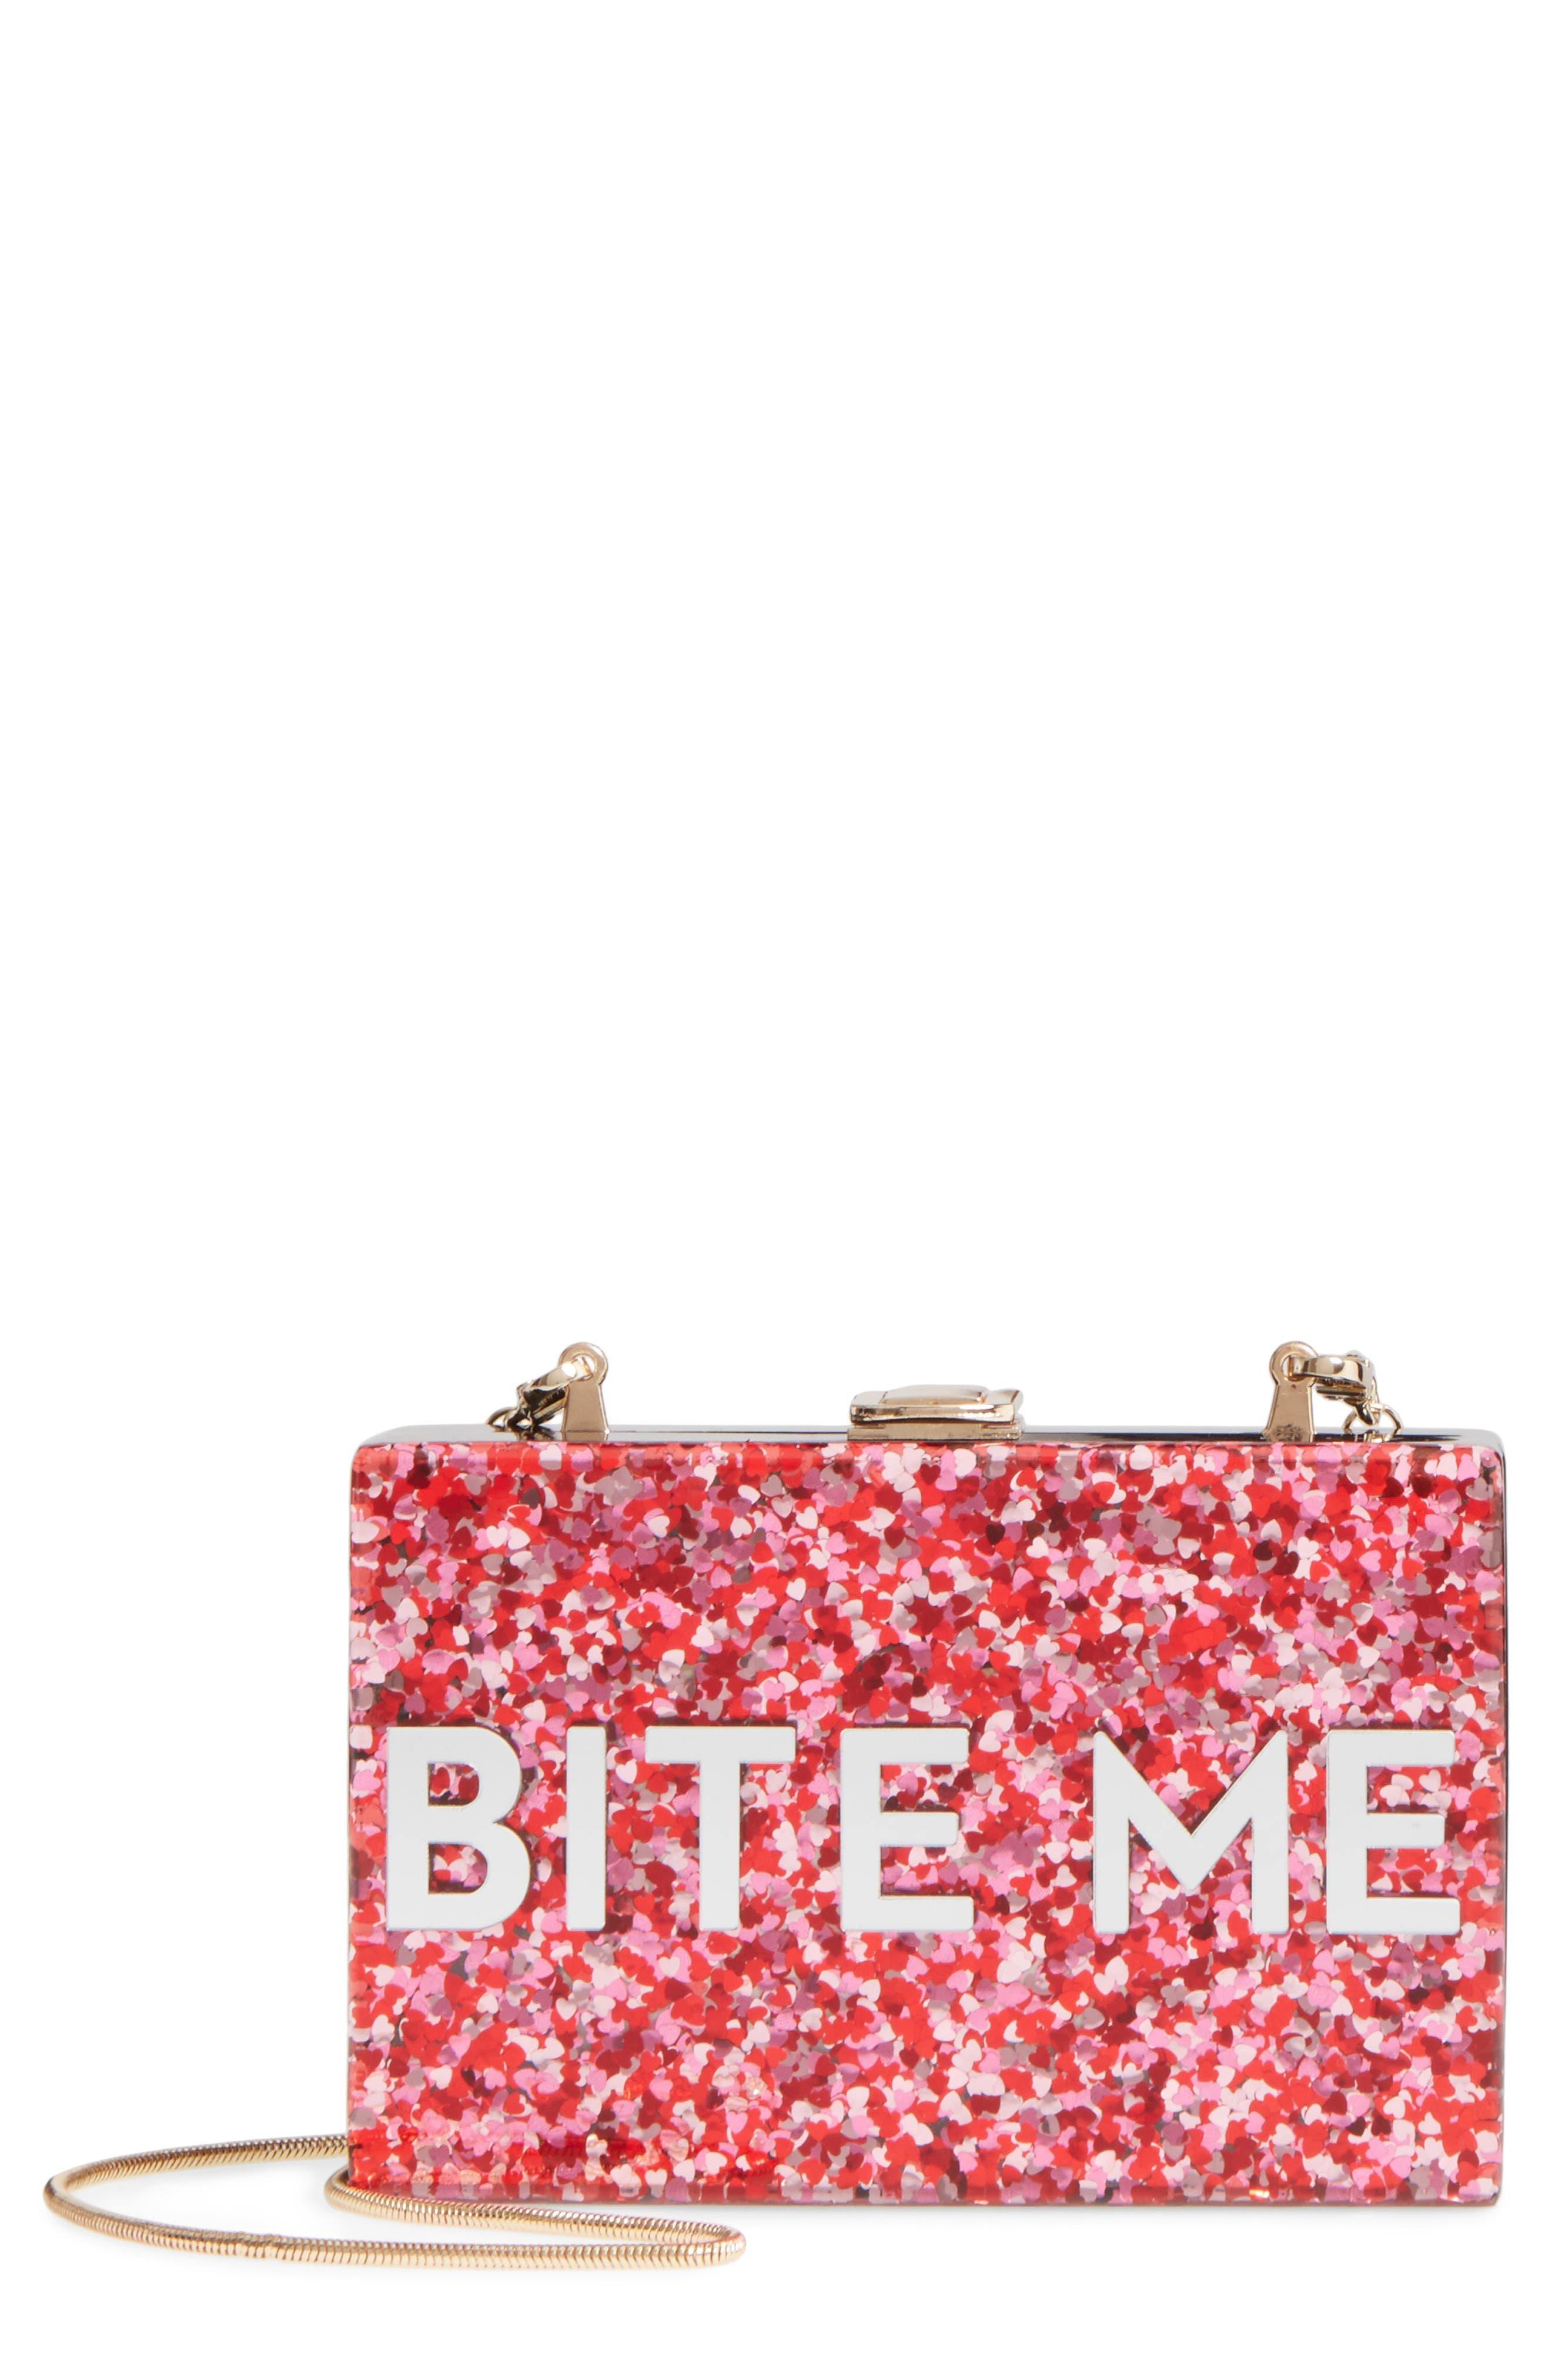 Milly Bite Me Glitter Box Clutch